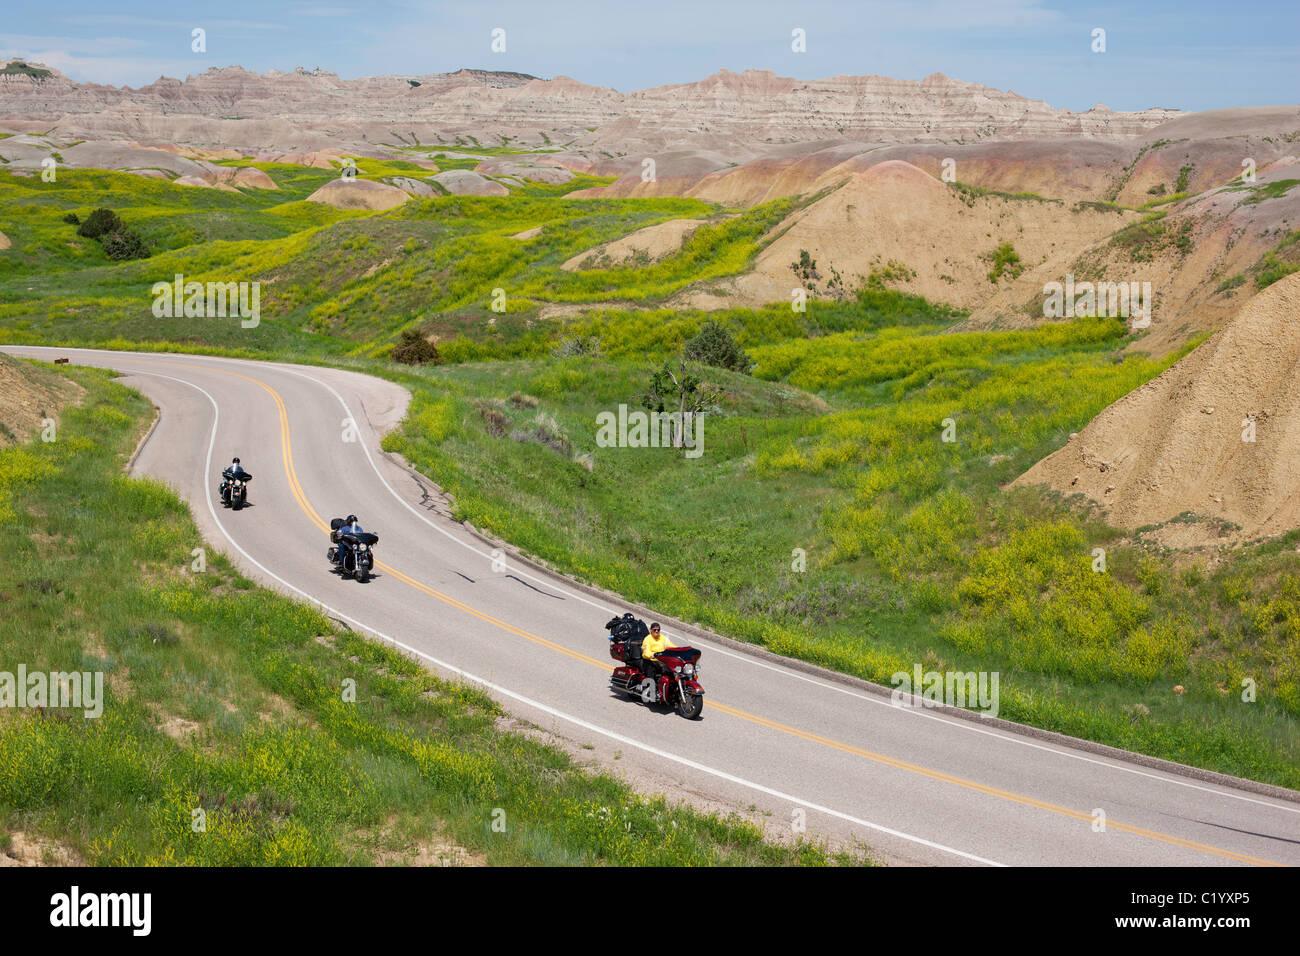 MOTORCYCLISTS riding their Harley-Davidson in Badlands National Park, South Dakota, USA. - Stock Image